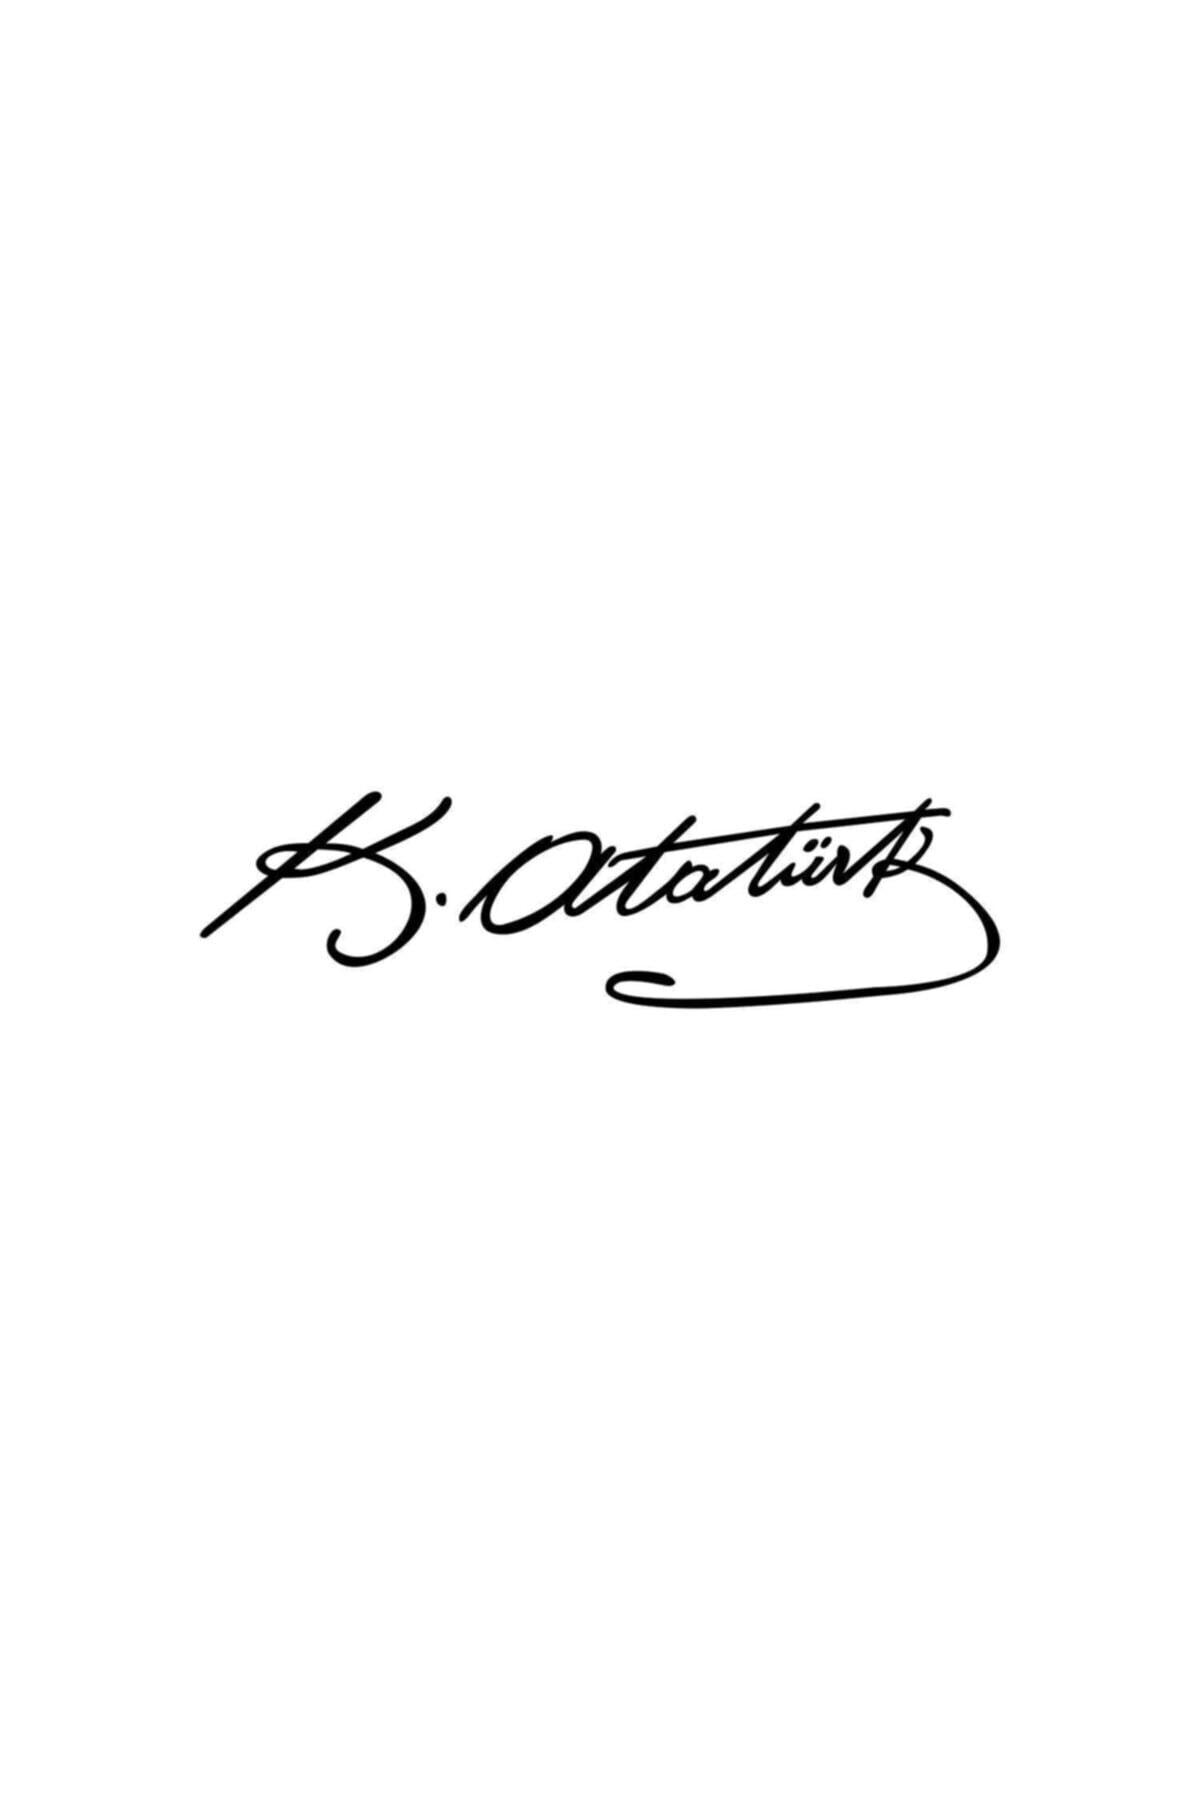 Sticker Masters Kemal Atatürk İmzası Siyah 20 cm Oto Sticker 1